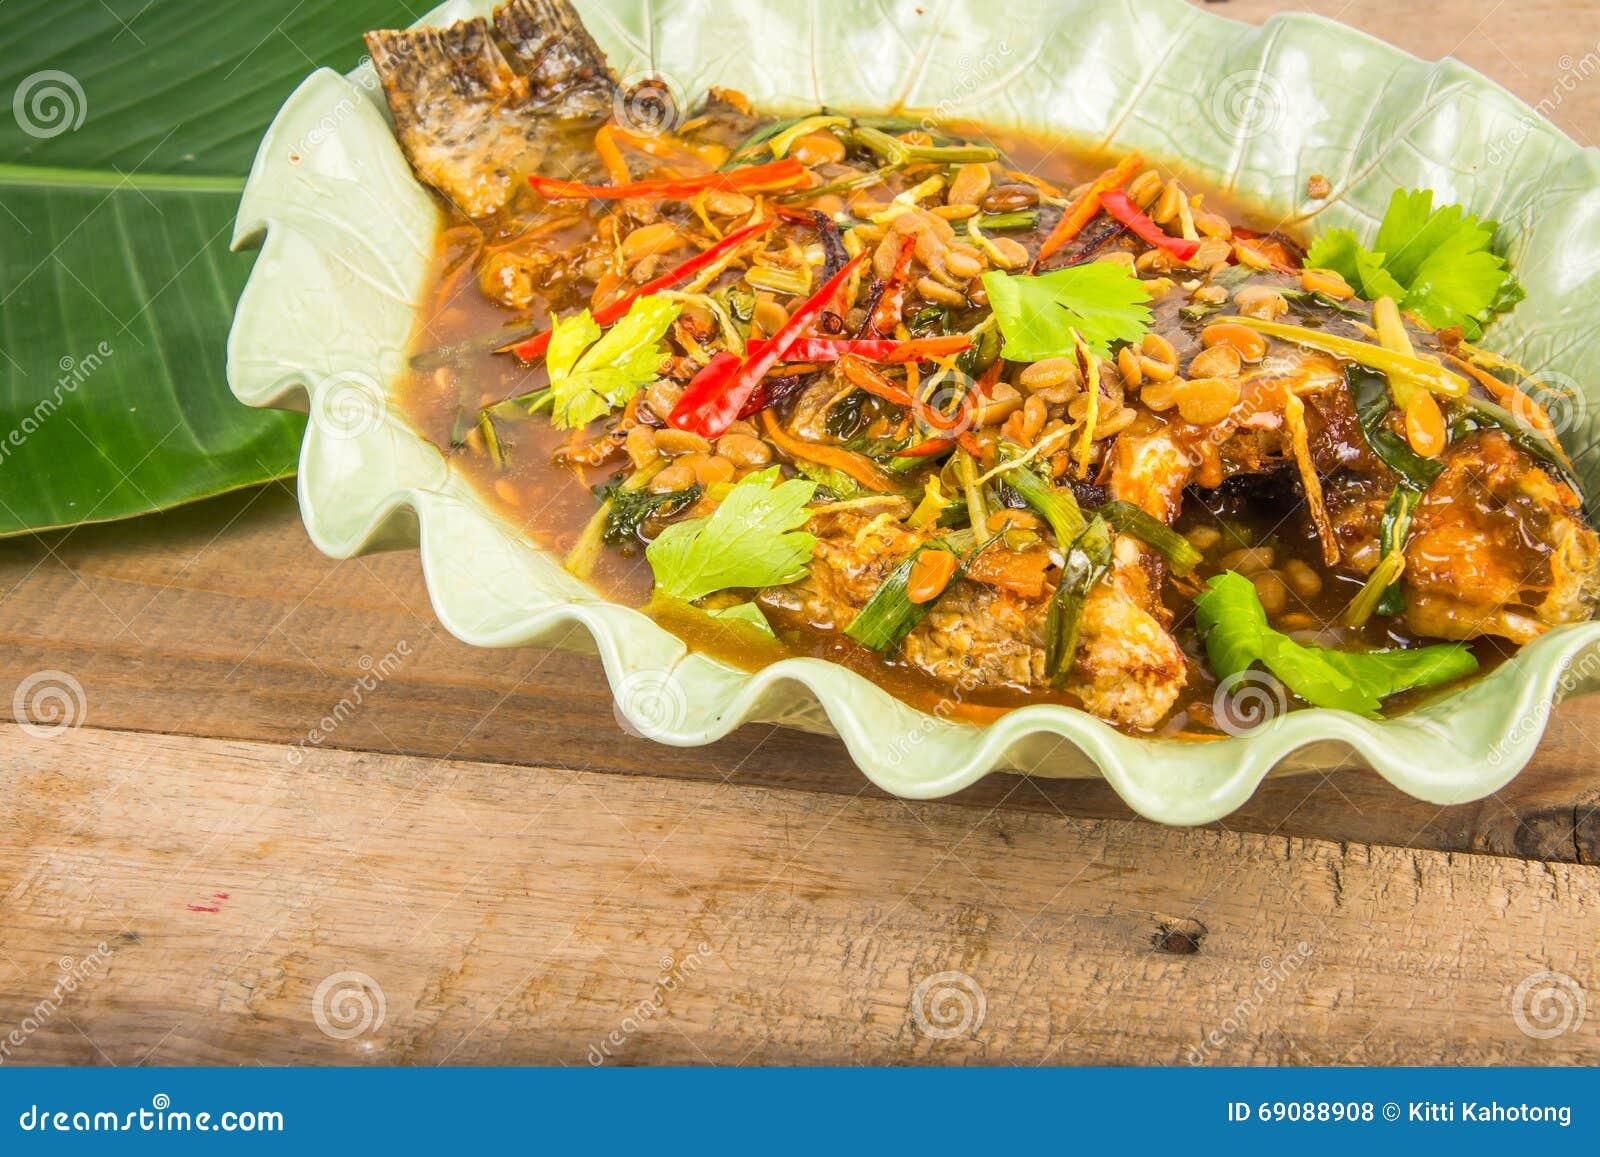 Asian Food Market Fried Fish